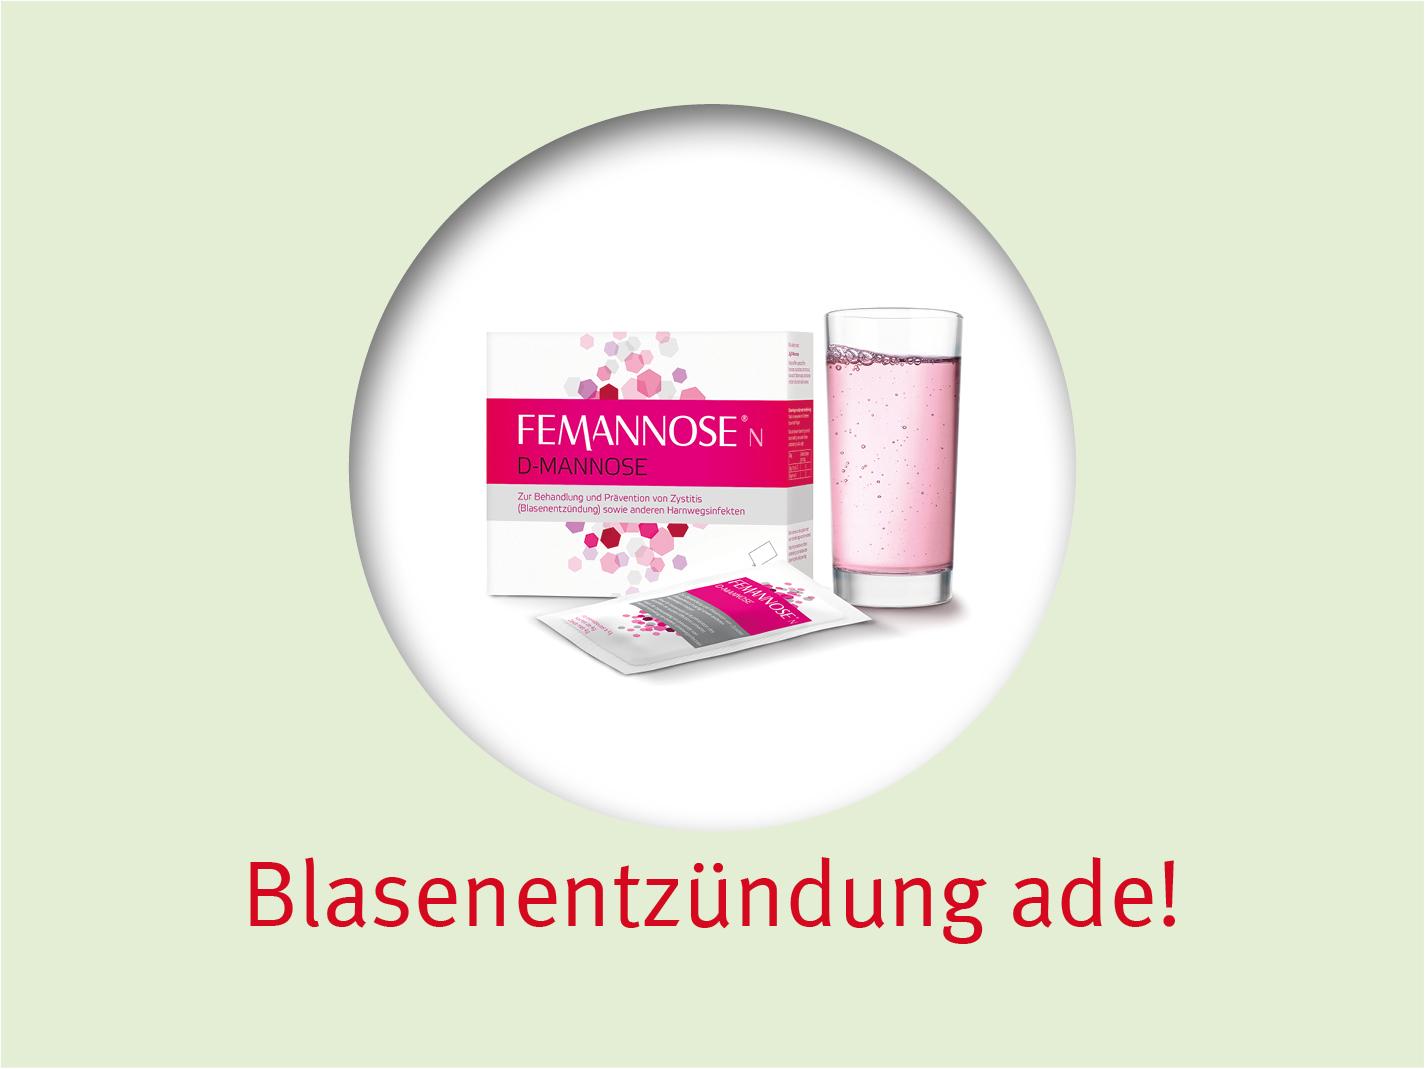 femannose_n_teaserbox_1.jpg